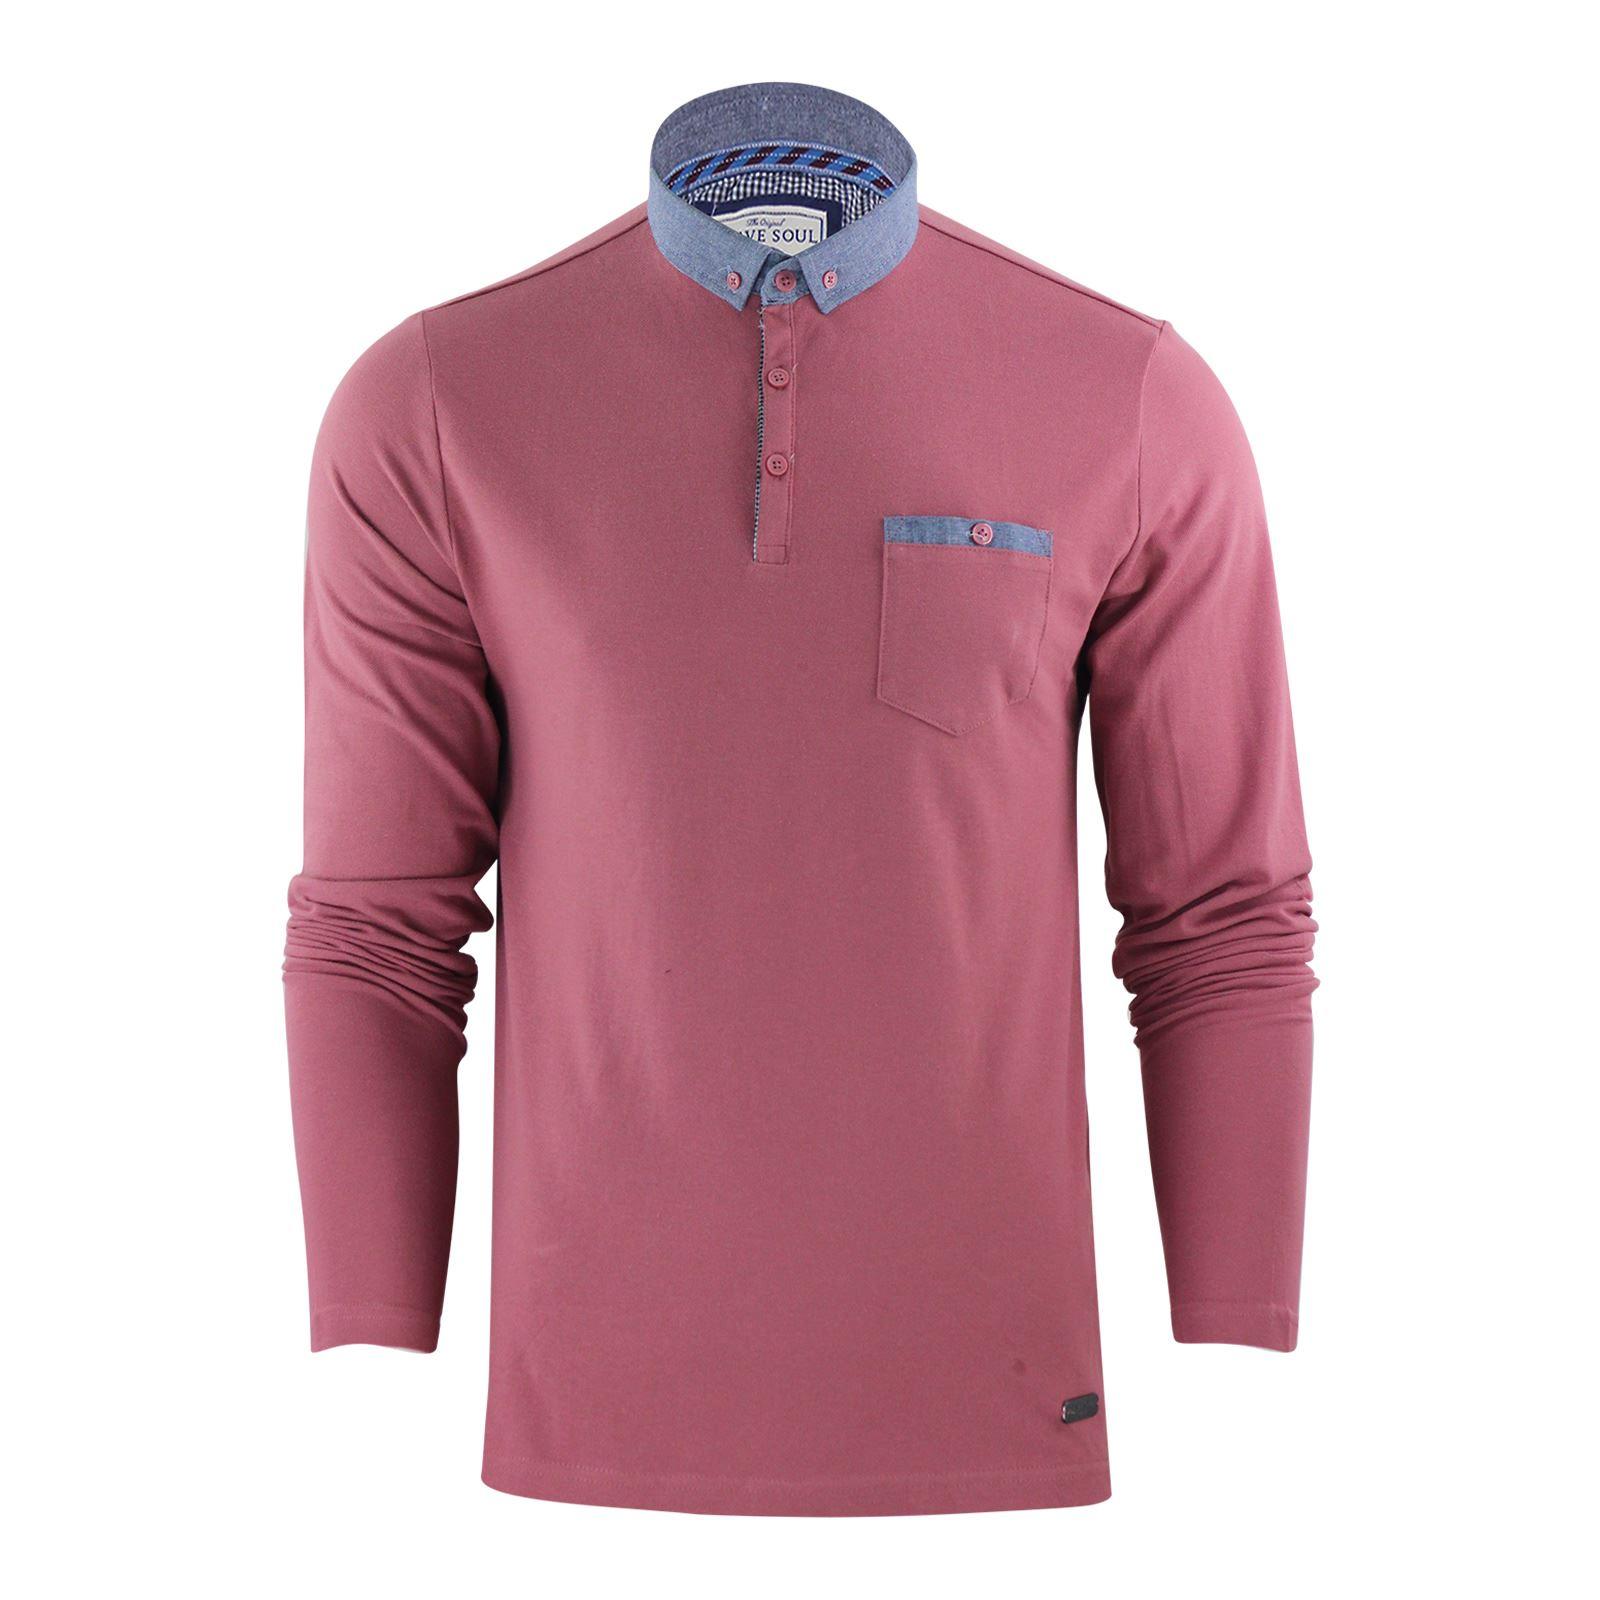 thumbnail 17 - Mens-Polo-T-Shirt-Brave-Soul-Hera-Cotton-Long-Sleeve-Casual-Top